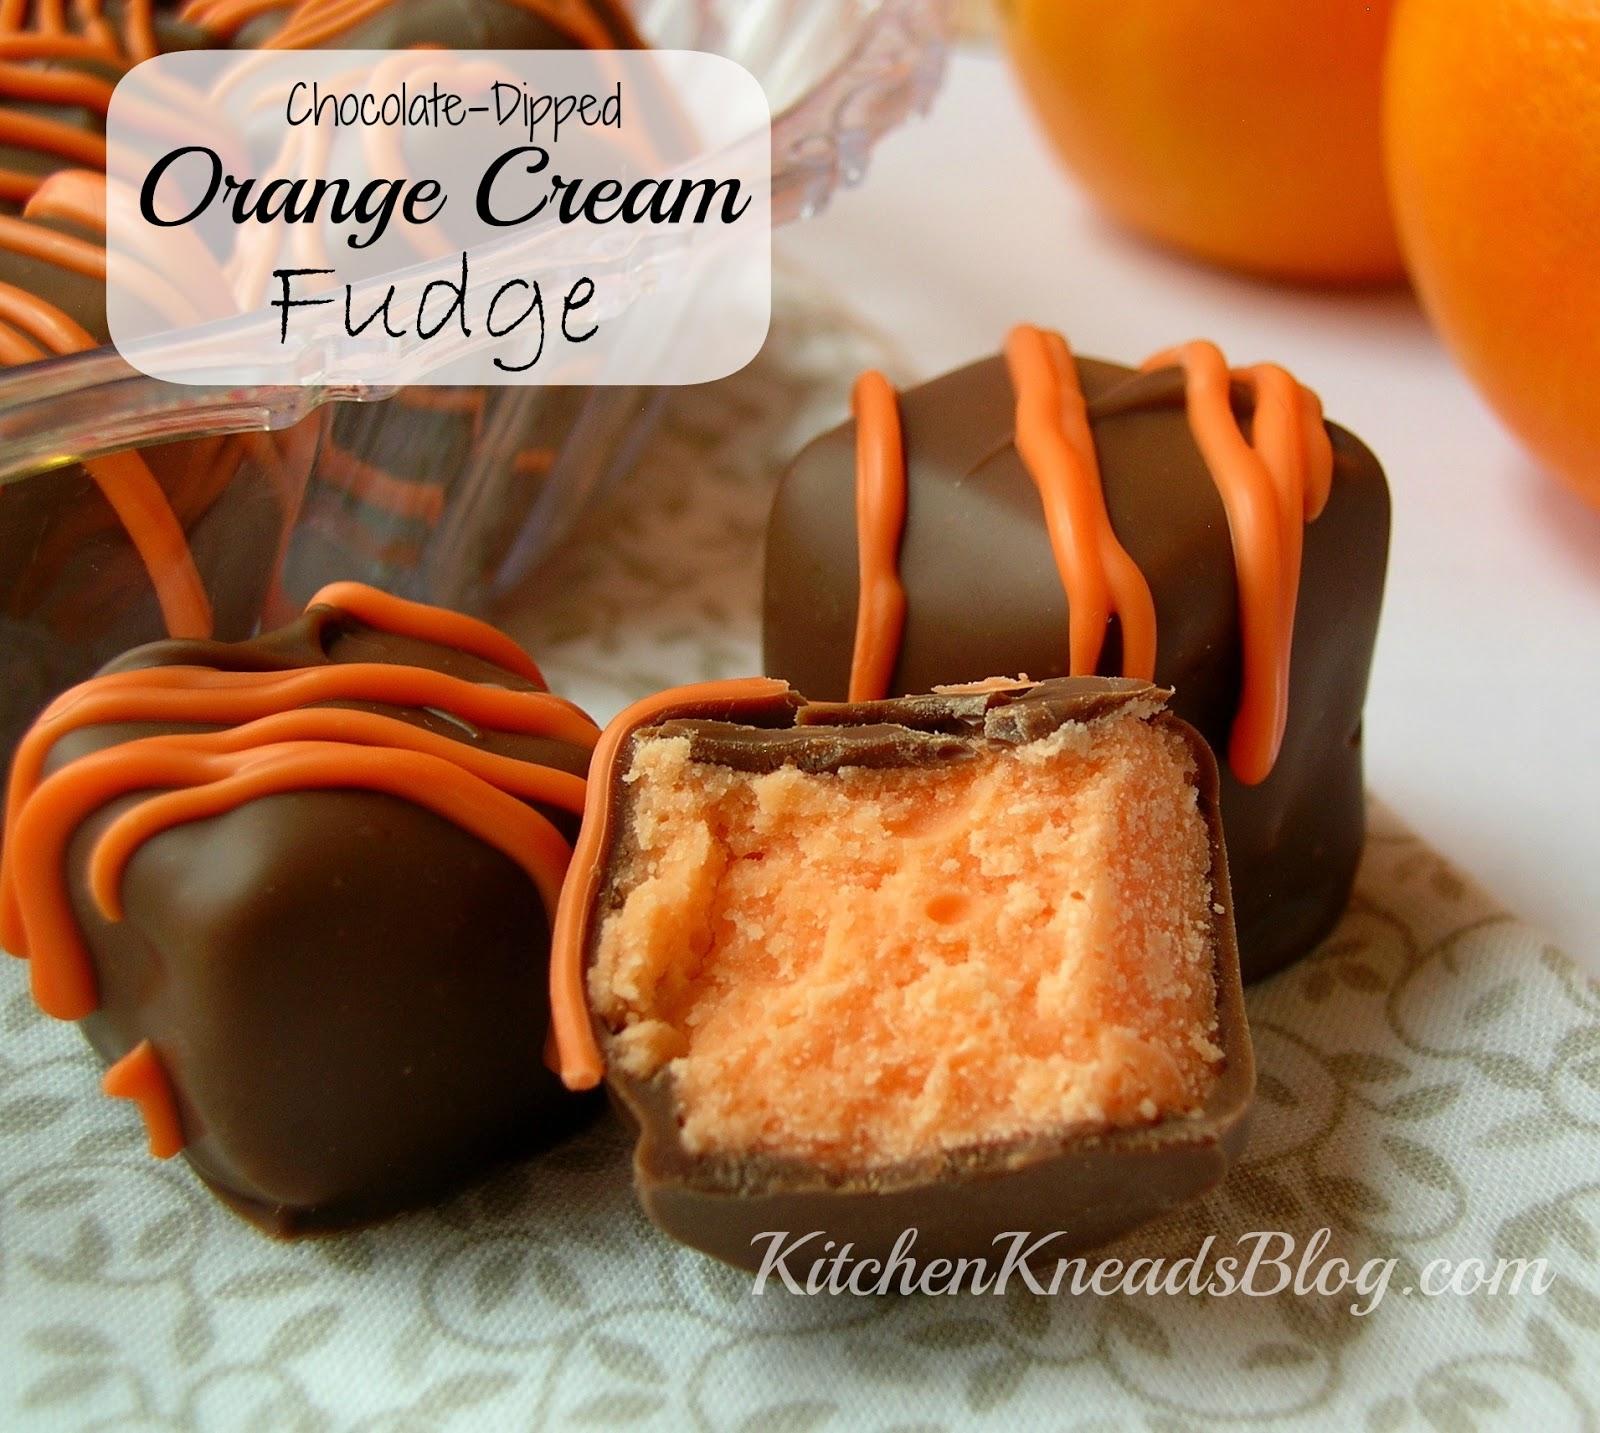 ChocolateDipped Orange Cream Fudge Kitchen Kneads